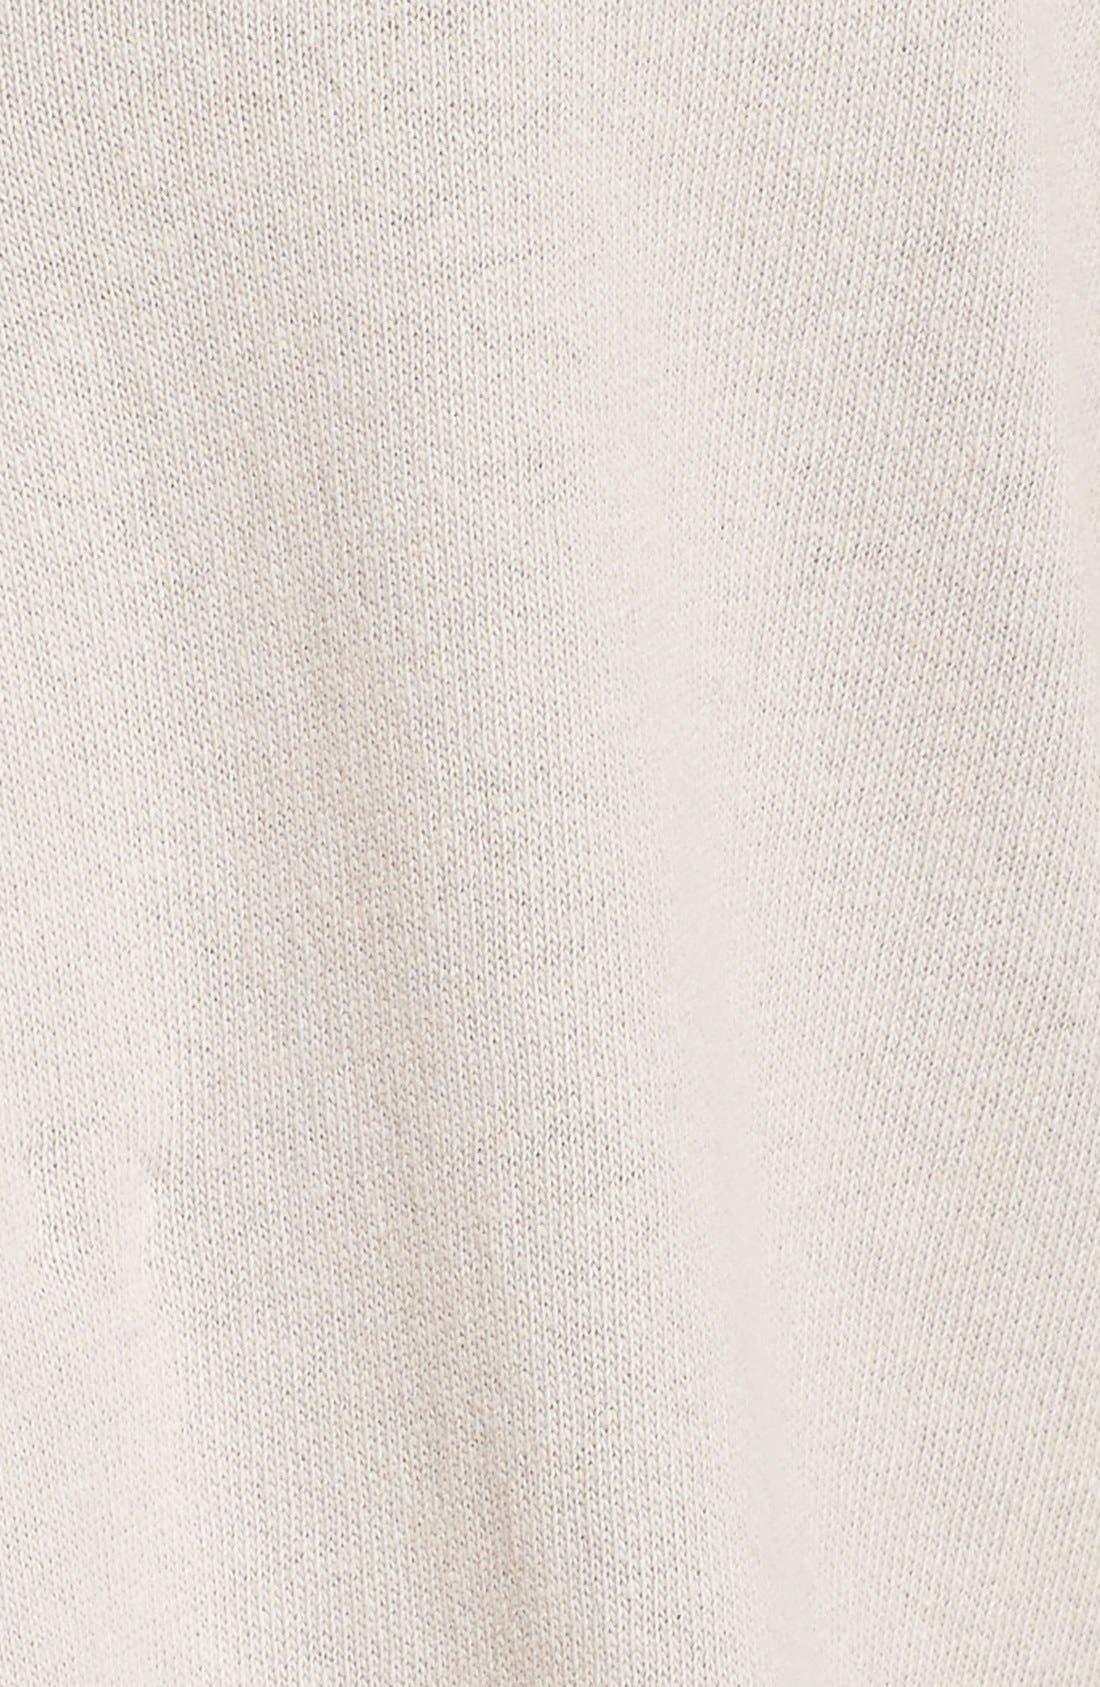 'Dallas' Cotton Henley Tee,                             Alternate thumbnail 6, color,                             250